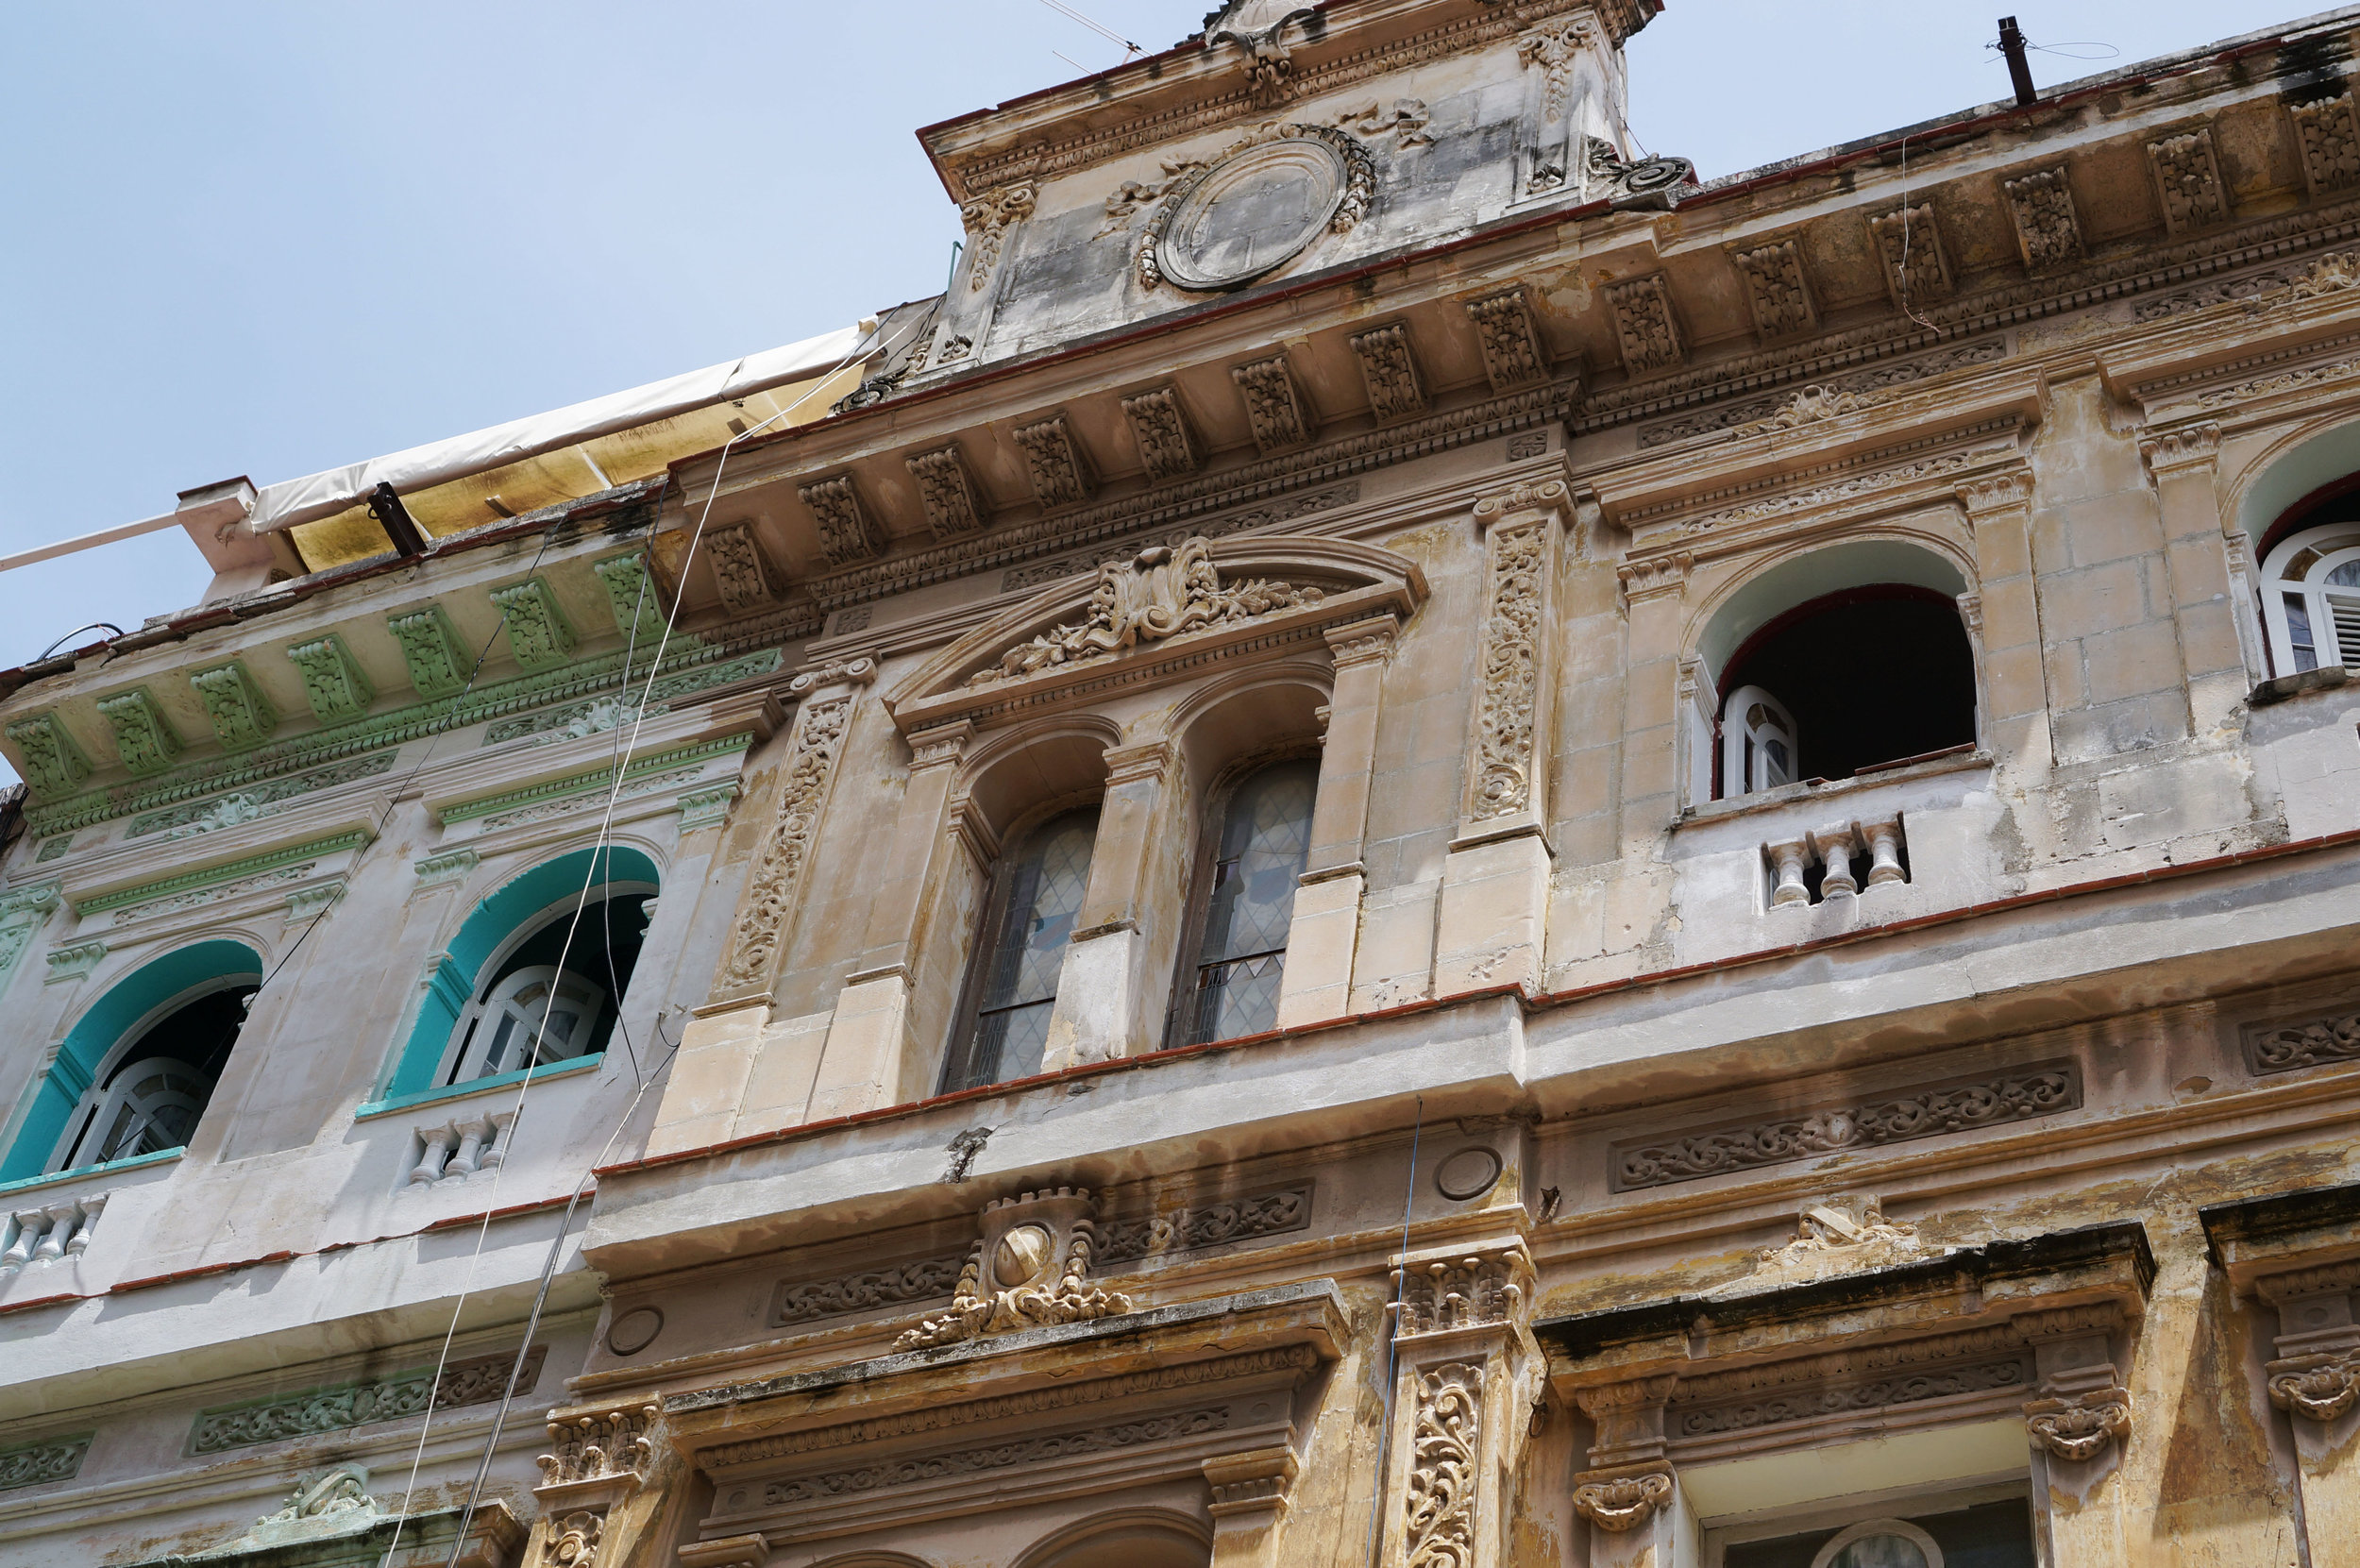 Stages of renovation / preservation.